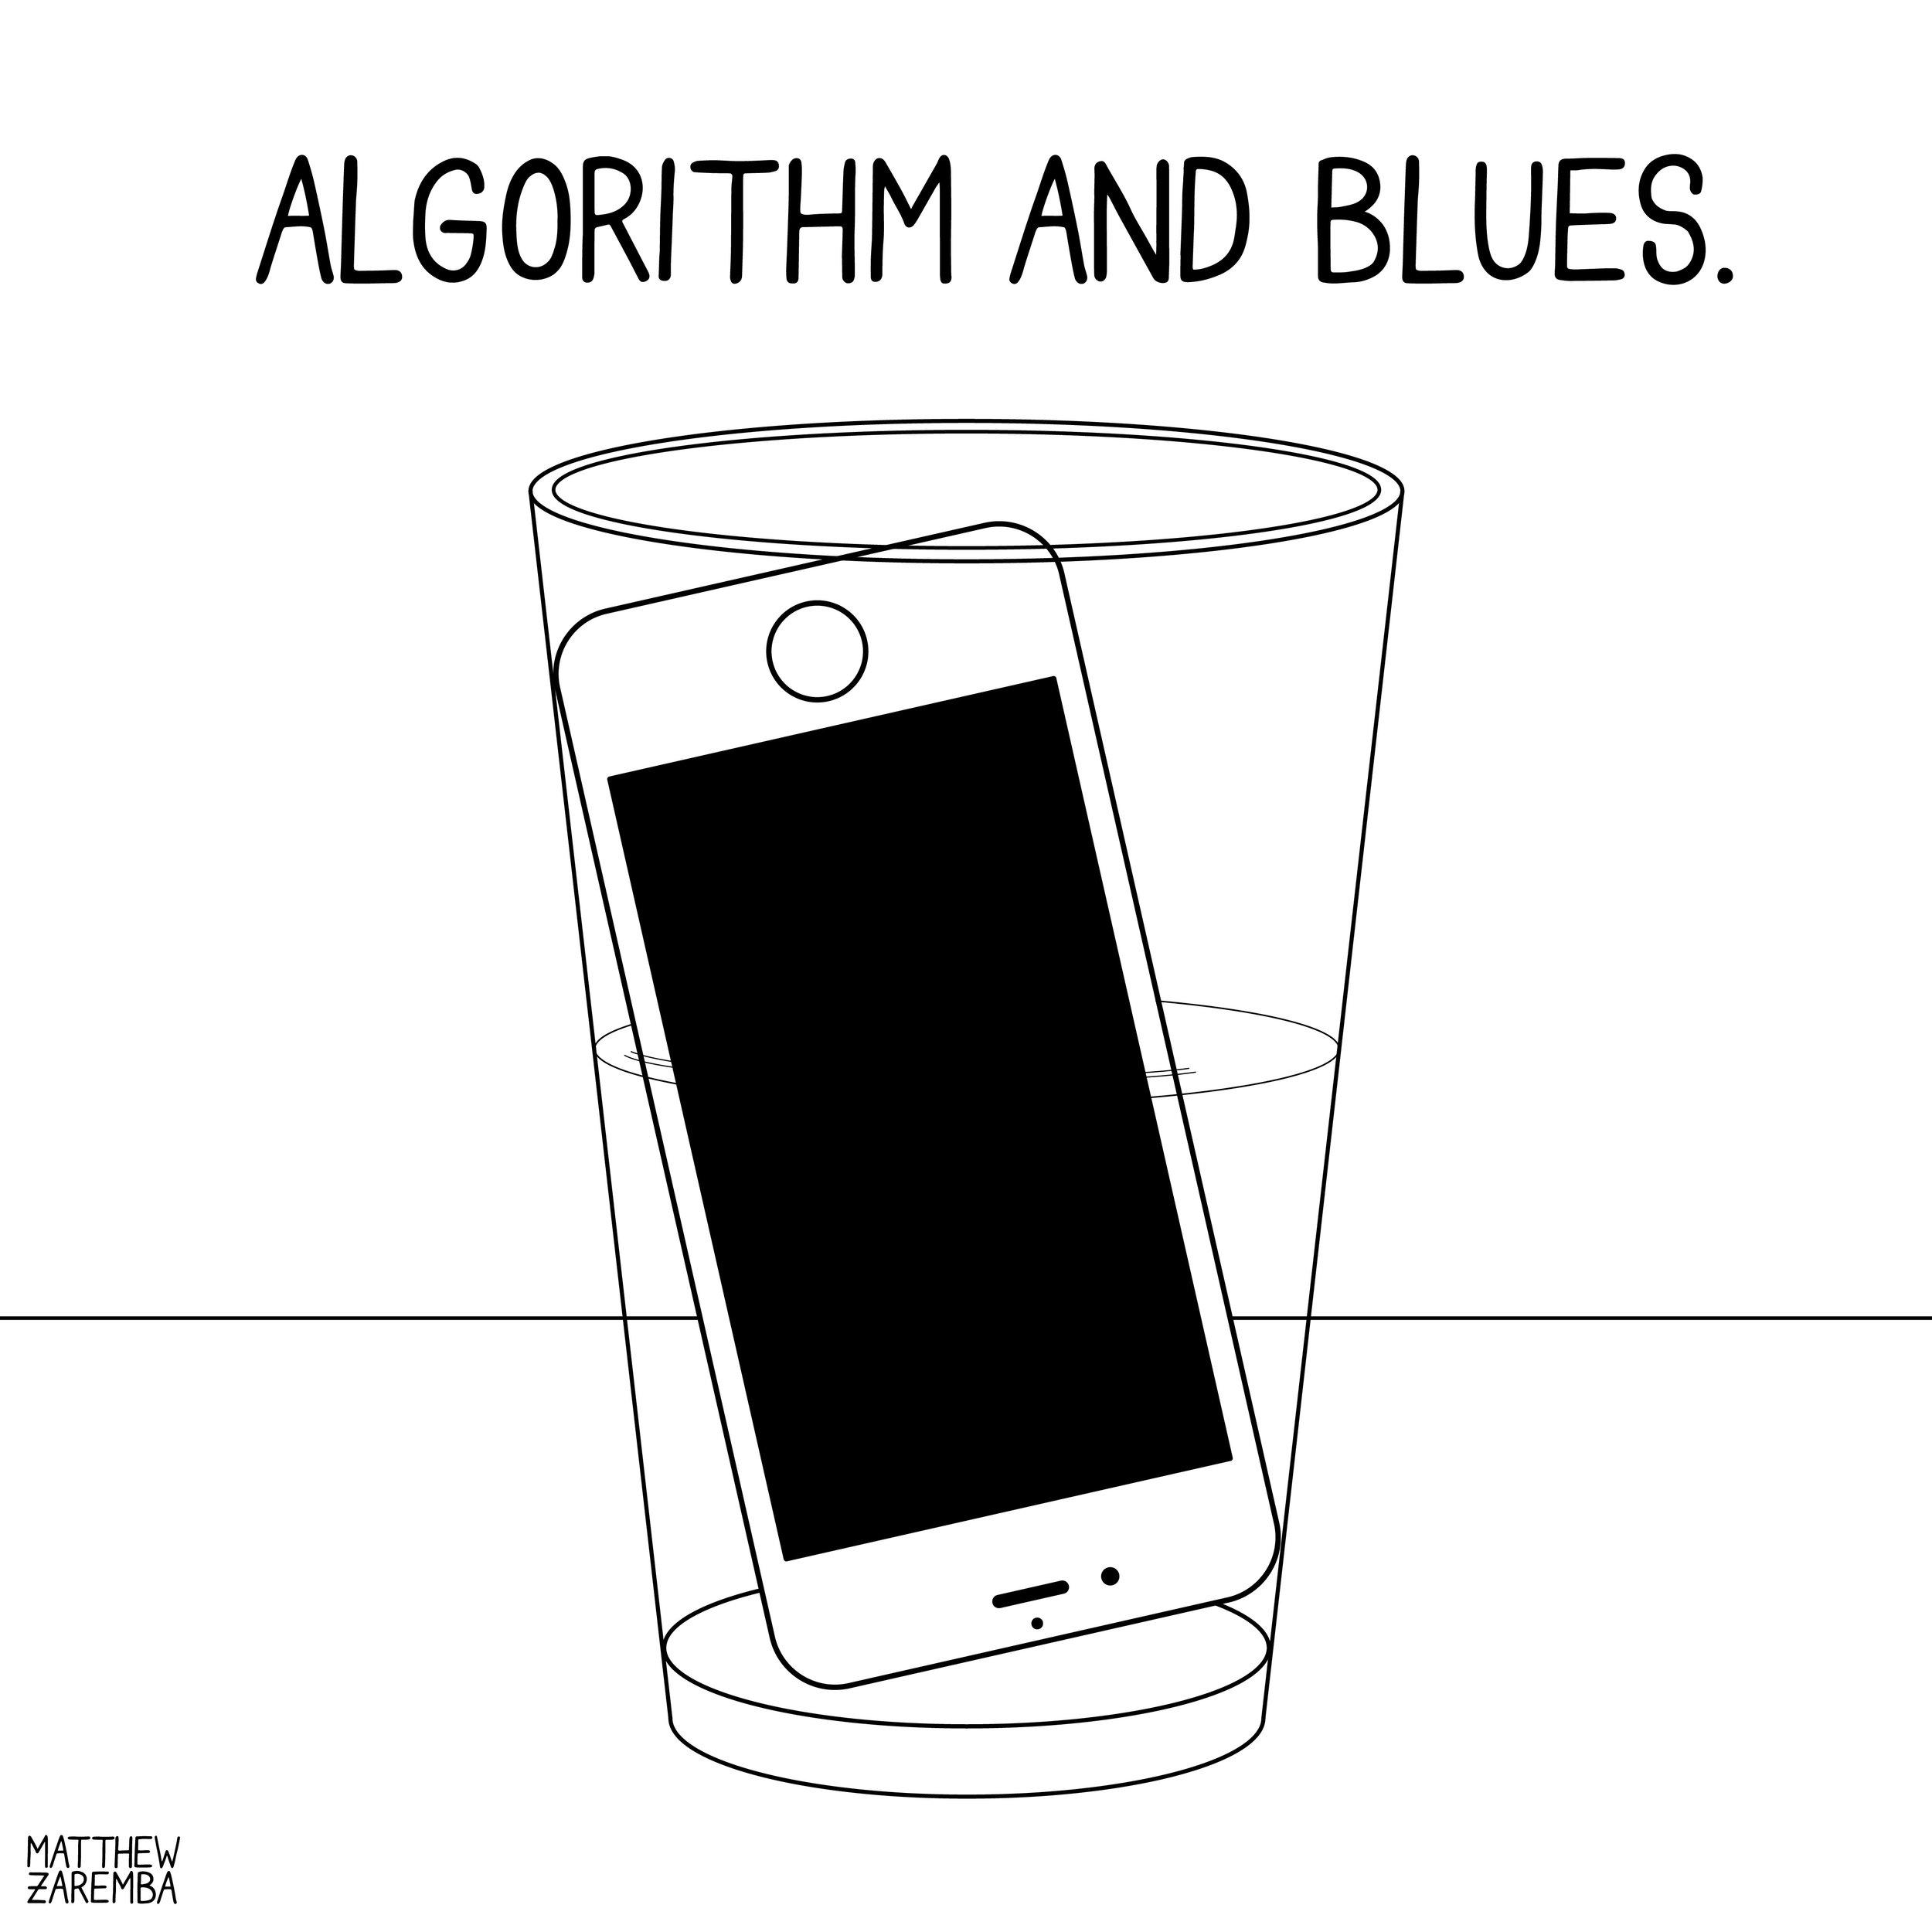 algorithmandblues-01.jpg